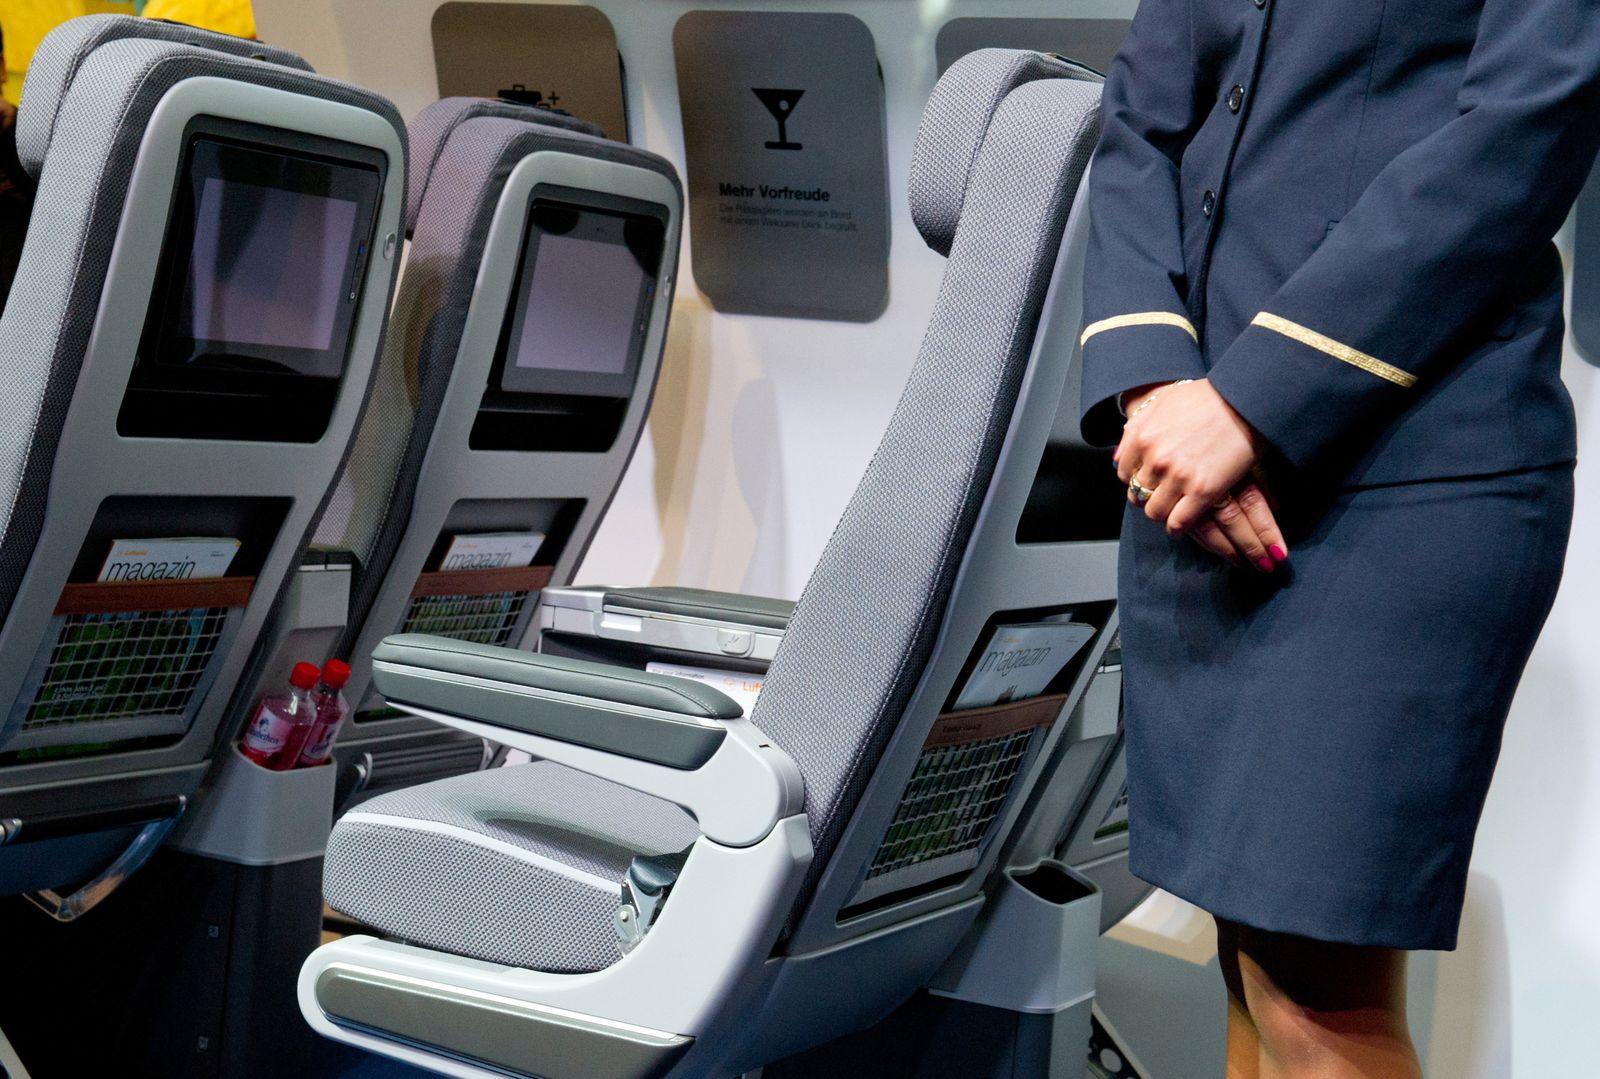 Flugbegleiter Lufthansa / Flugbegleiterin